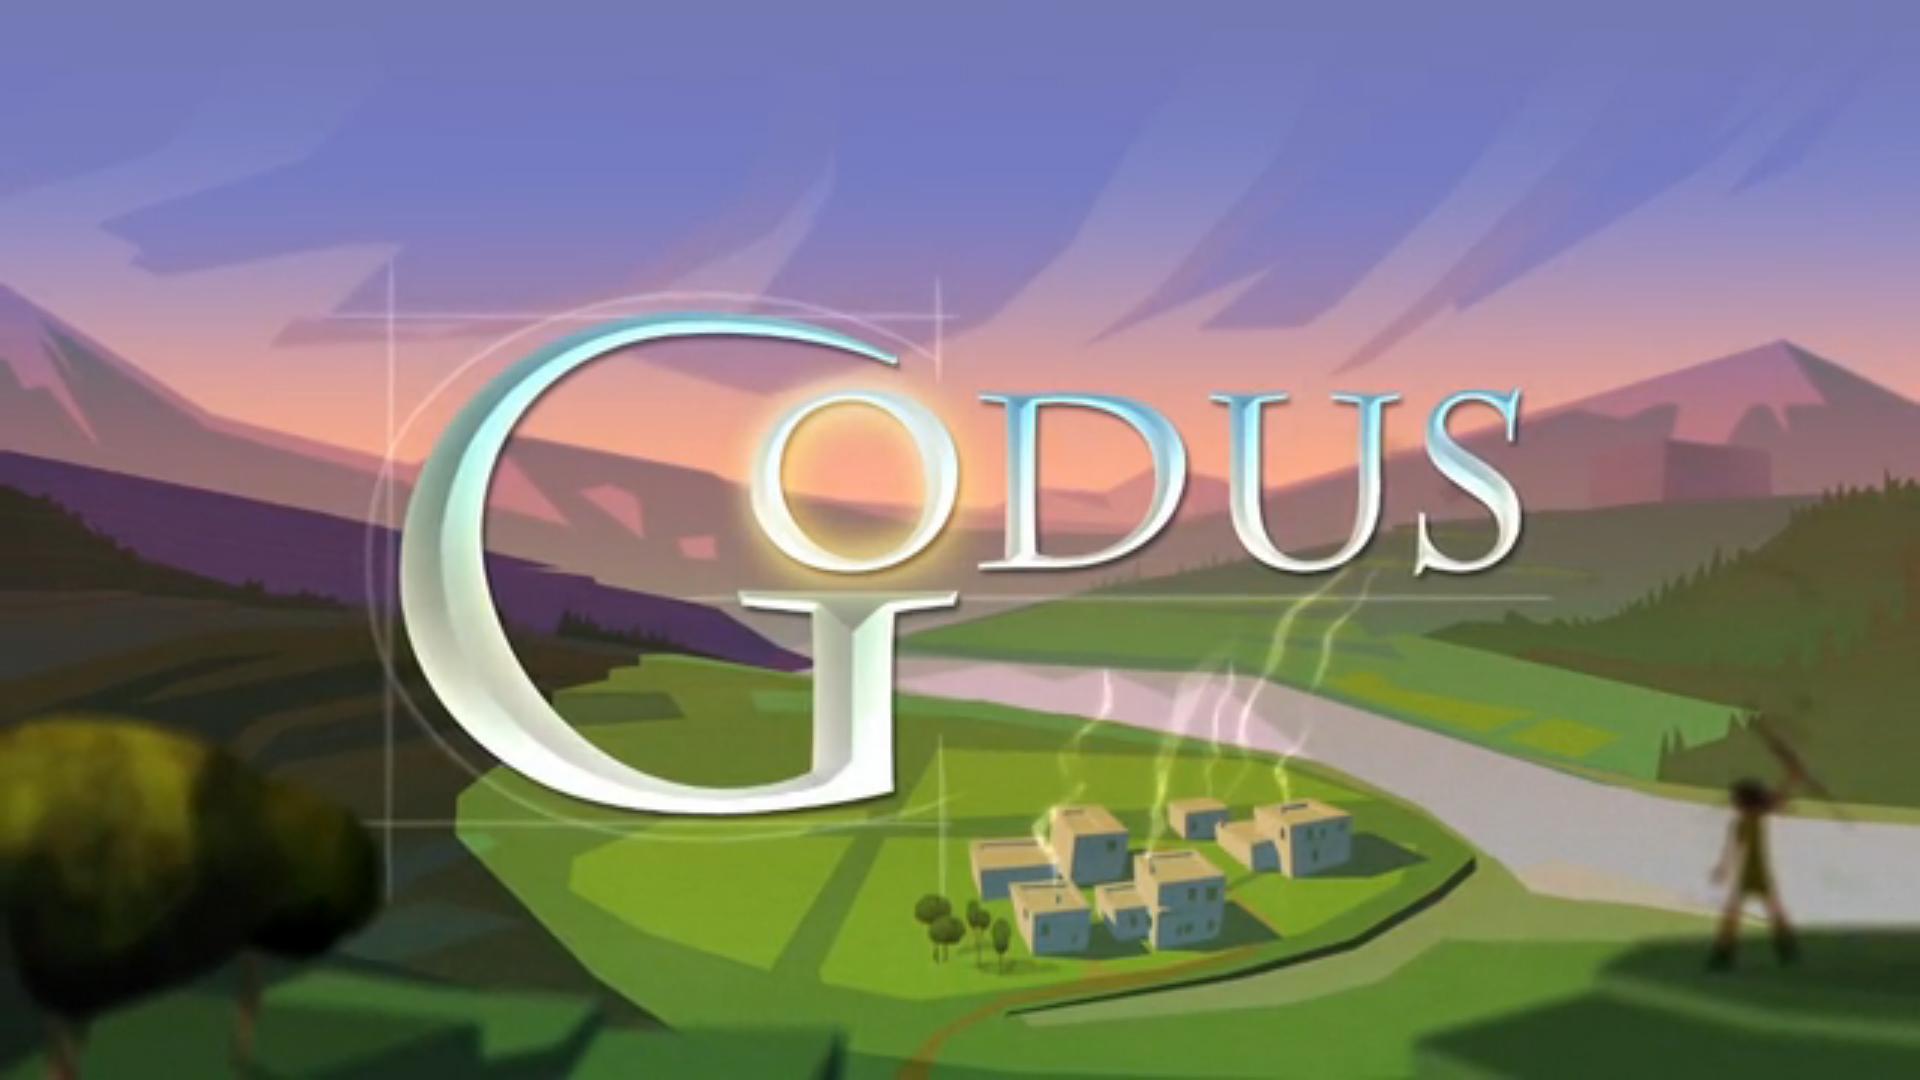 Godus header 19022013